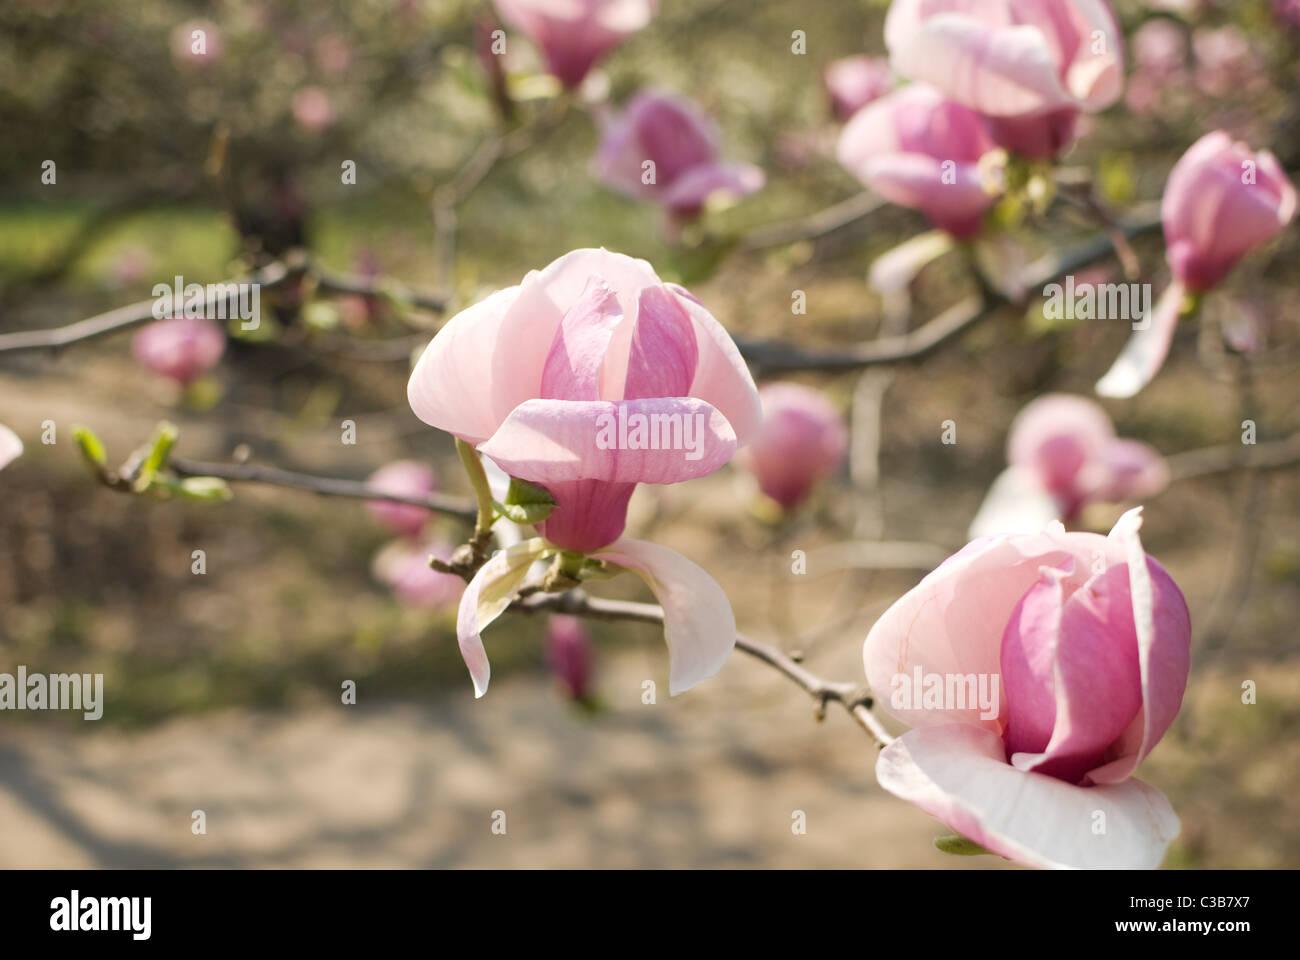 Big pink flowers stock photos big pink flowers stock images alamy big pink flowers of magnolia on tree stock image mightylinksfo